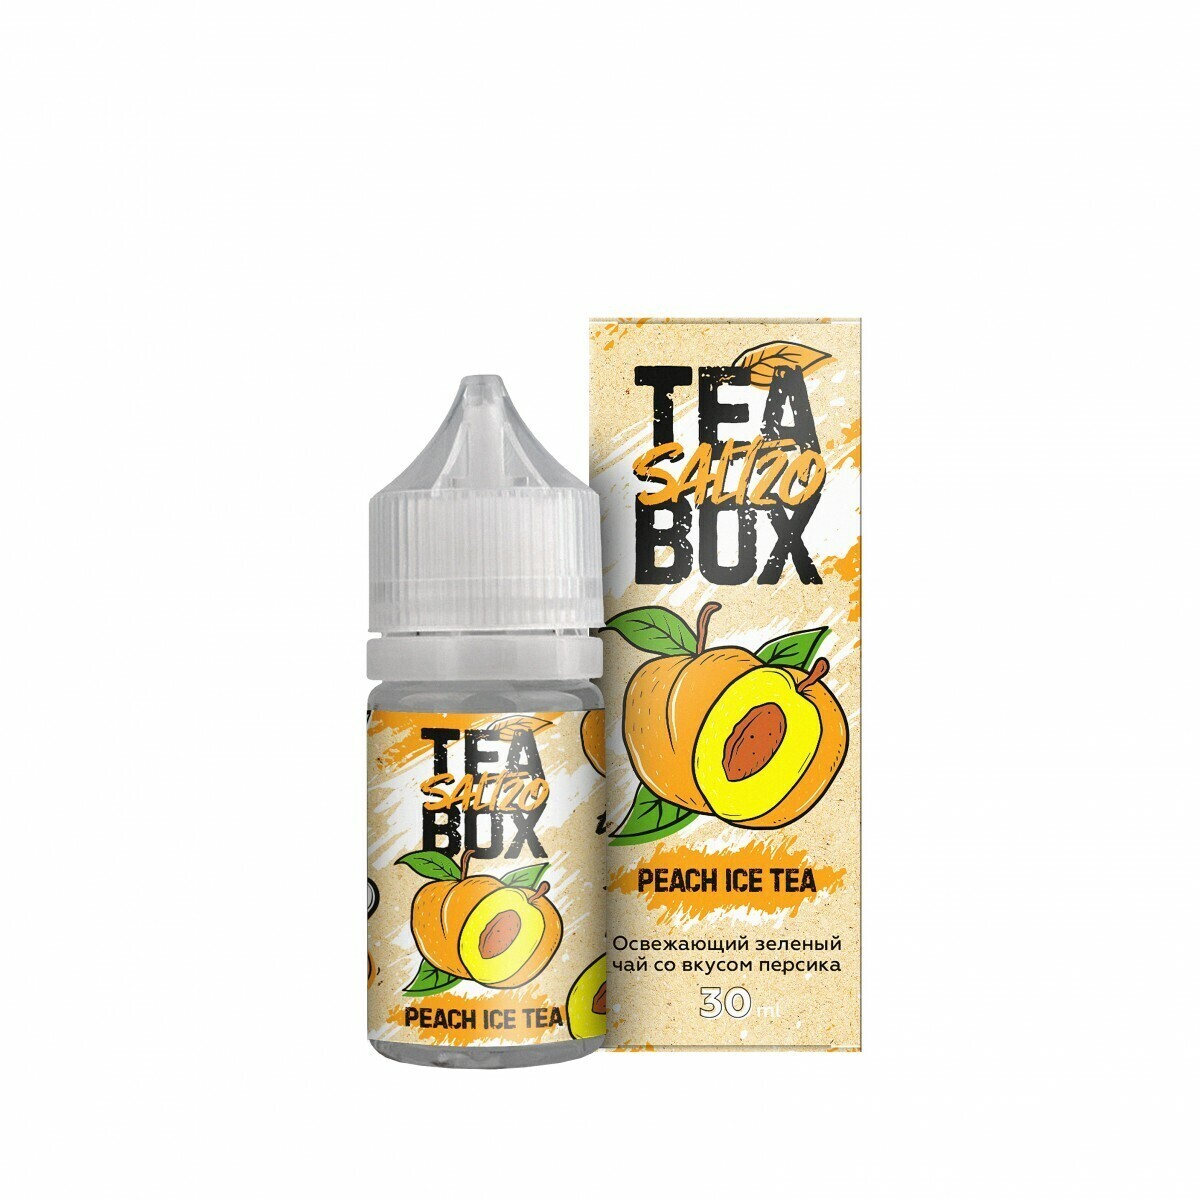 TEA BOX SALT: MANGO PINEAPPLE 30ML 20MG STRONG